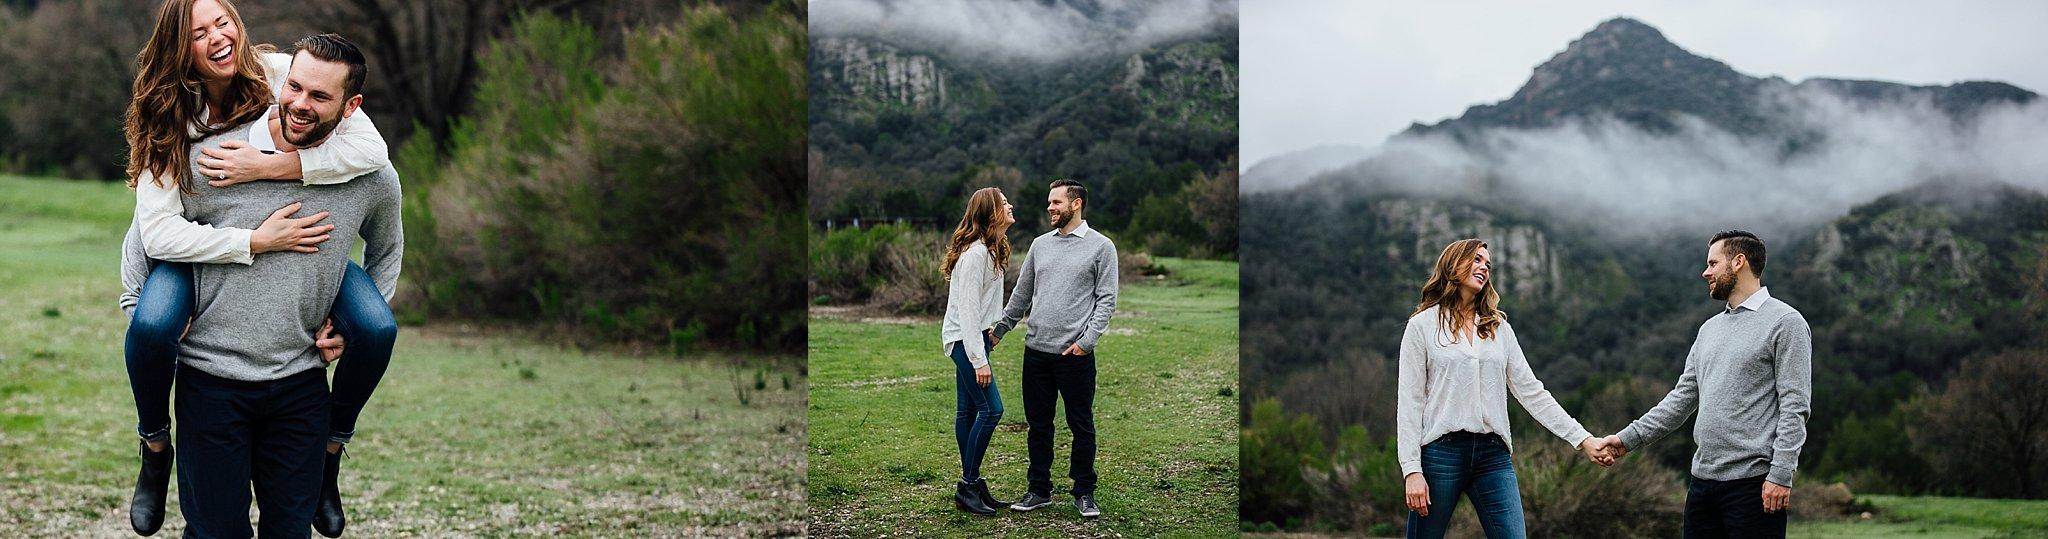 engagement-malibu-canyon-triptic